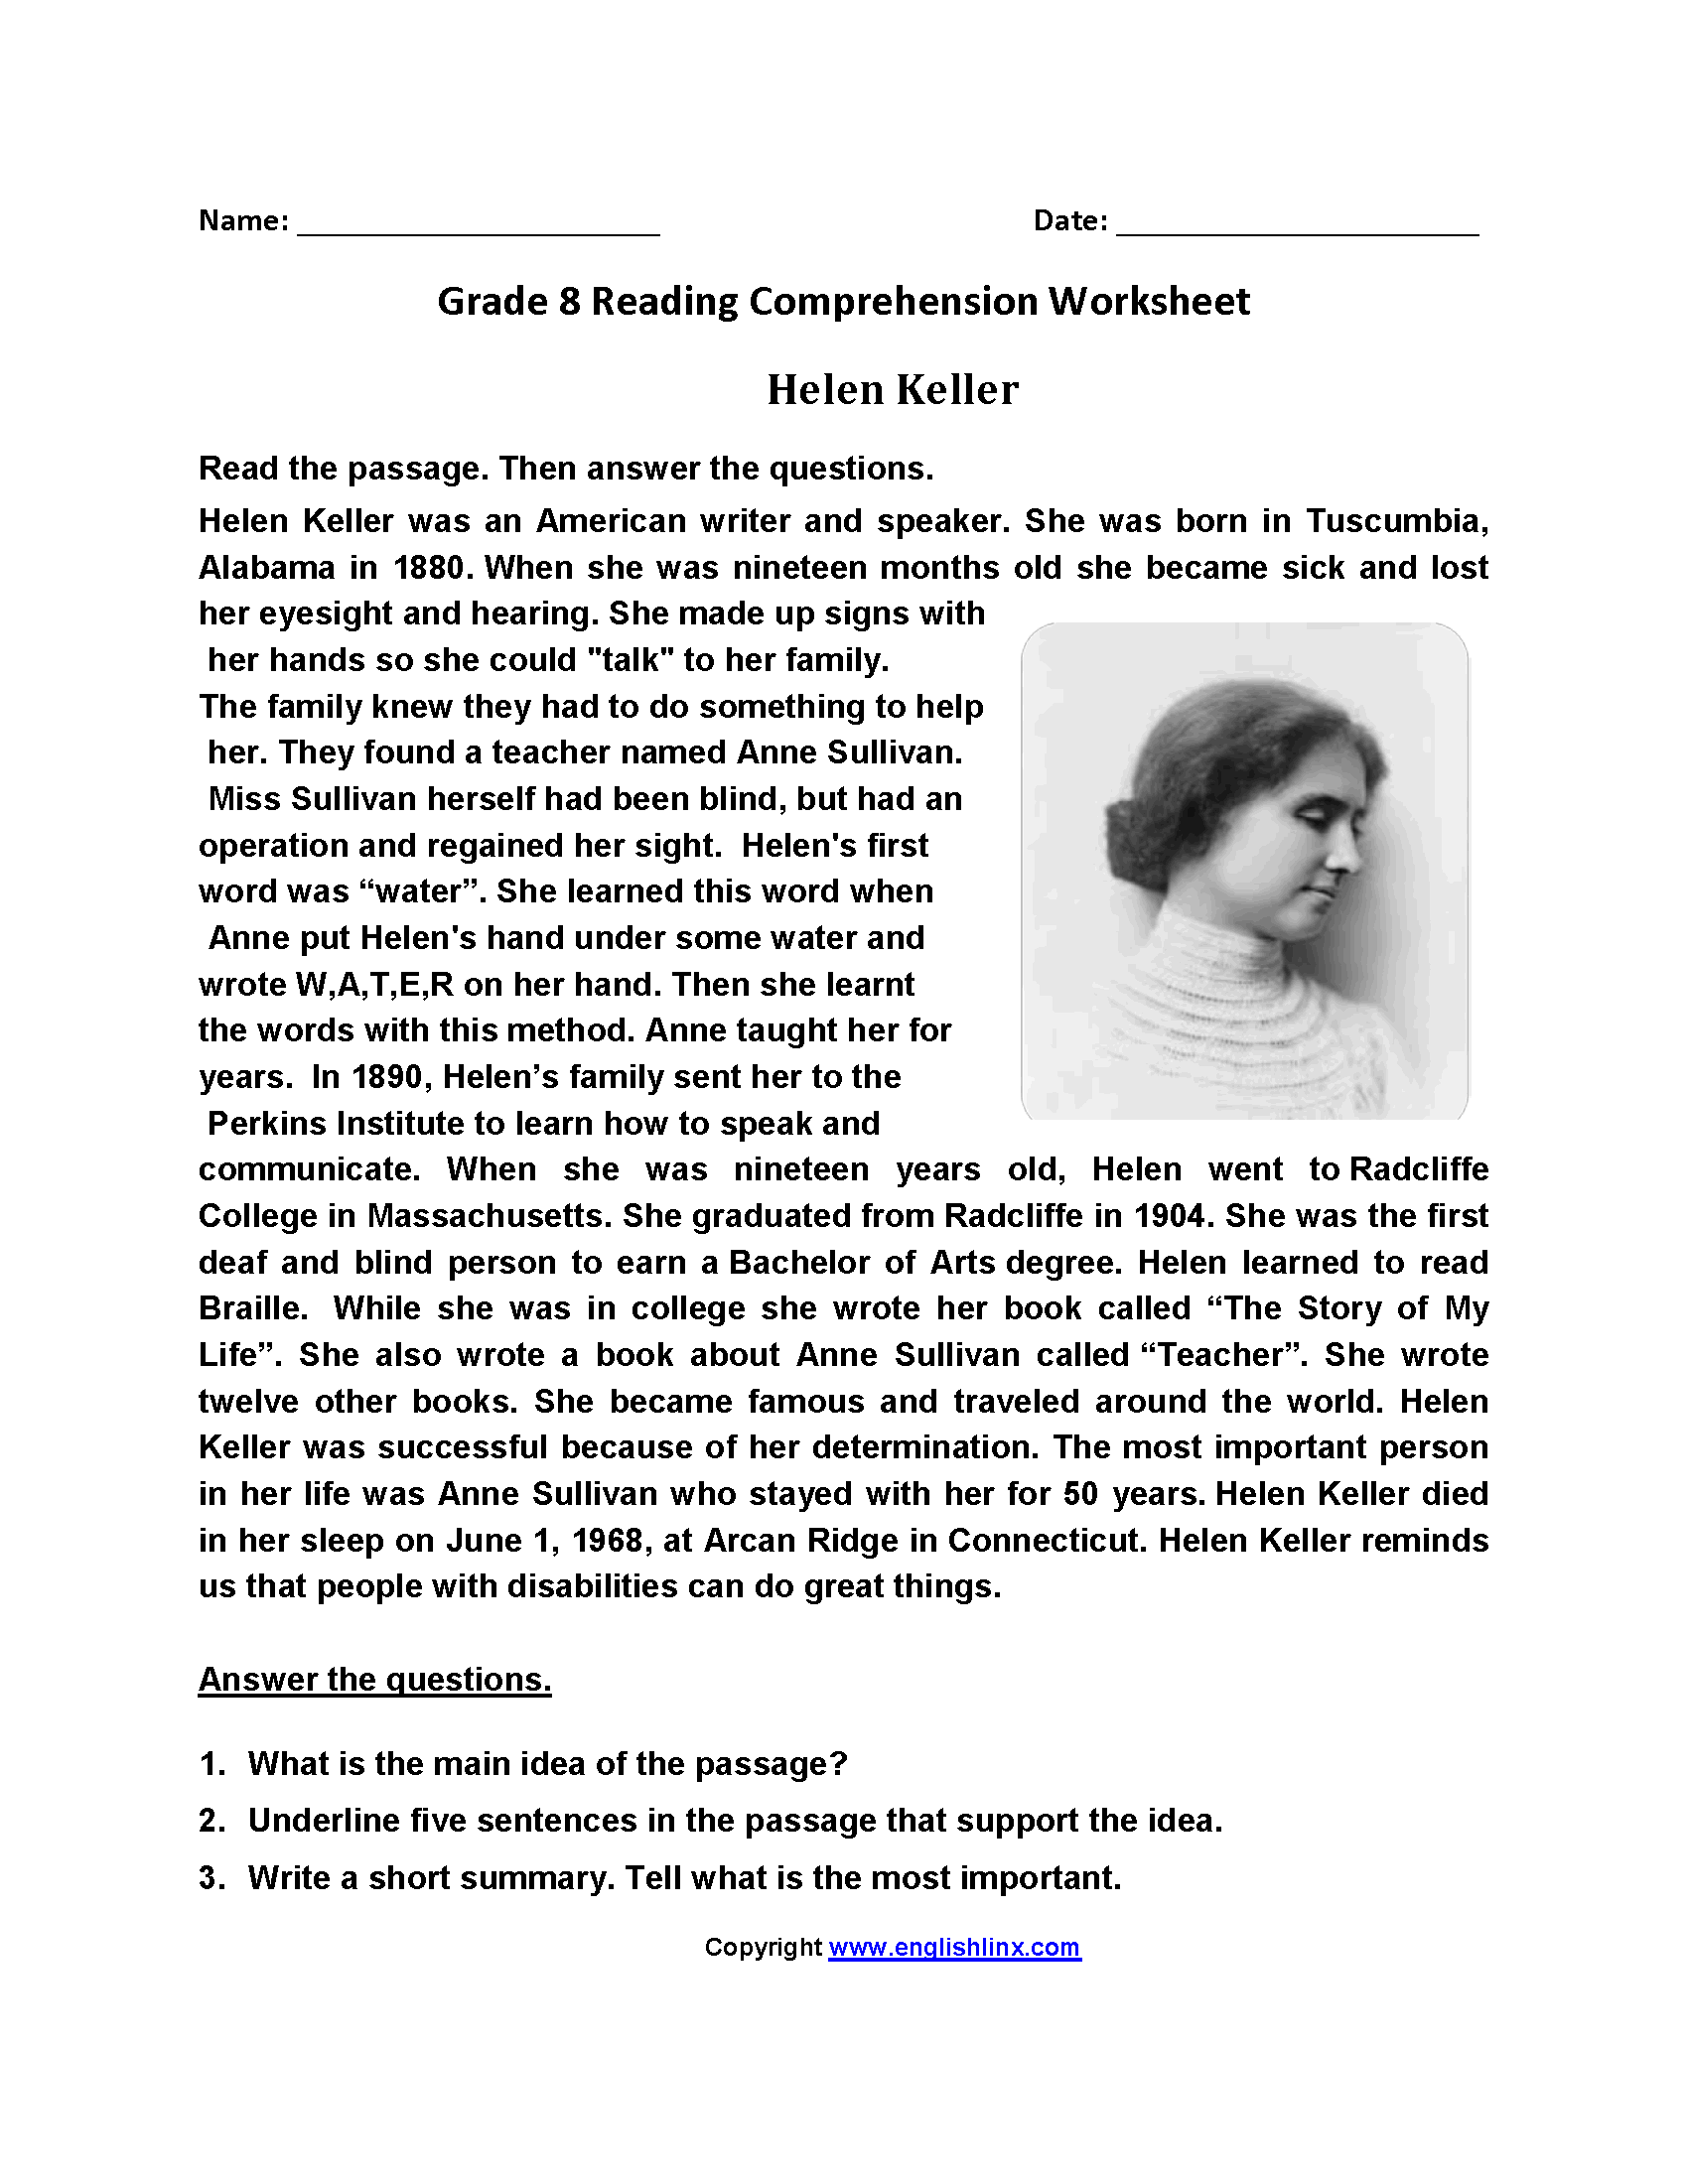 Helen Keller Short Biography Pdf